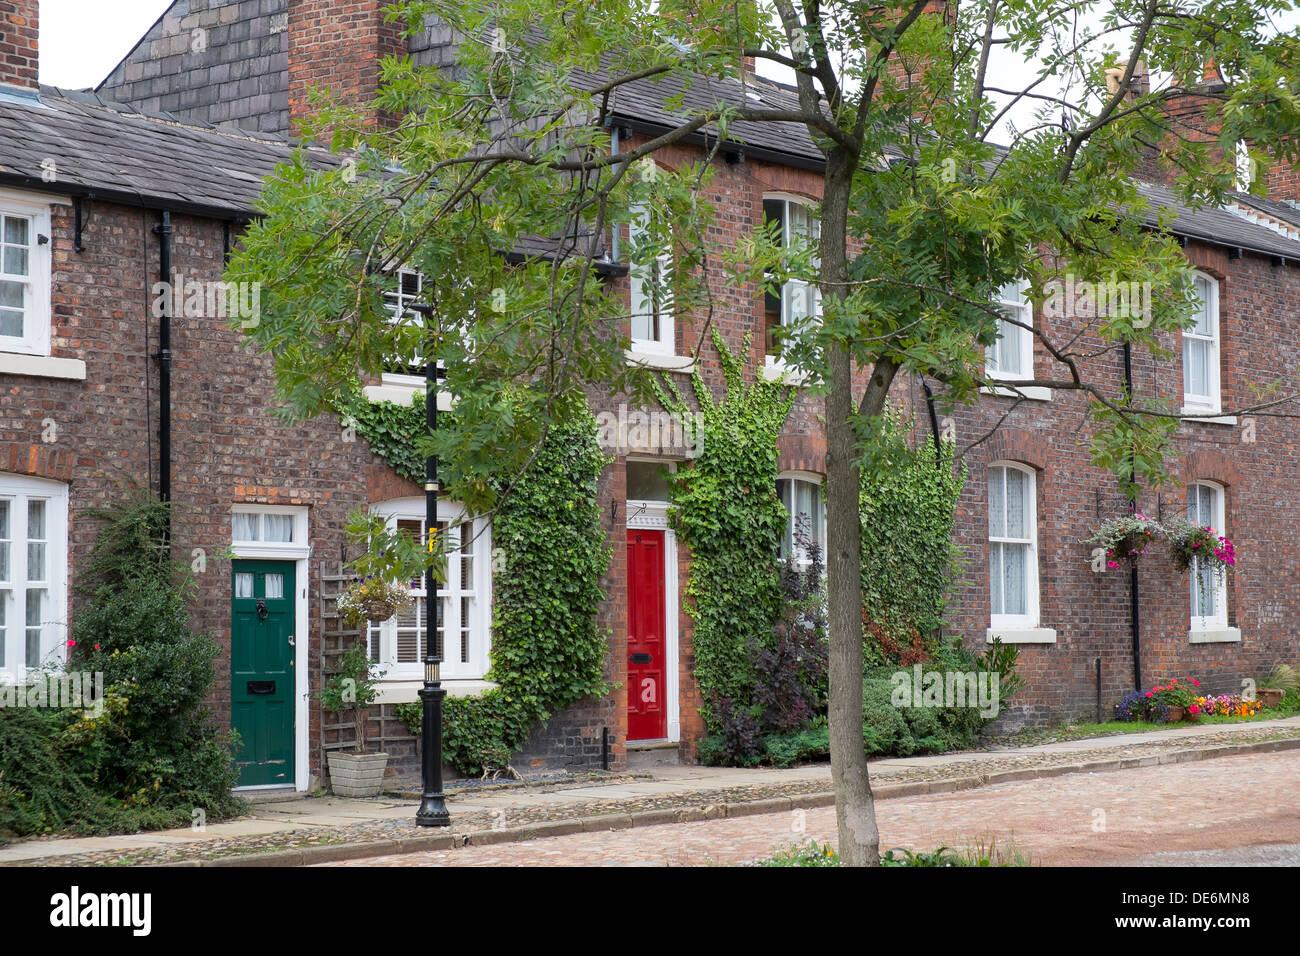 England, Greater Manchester, Droylsden, House in the Moravian Settlement - Stock Image